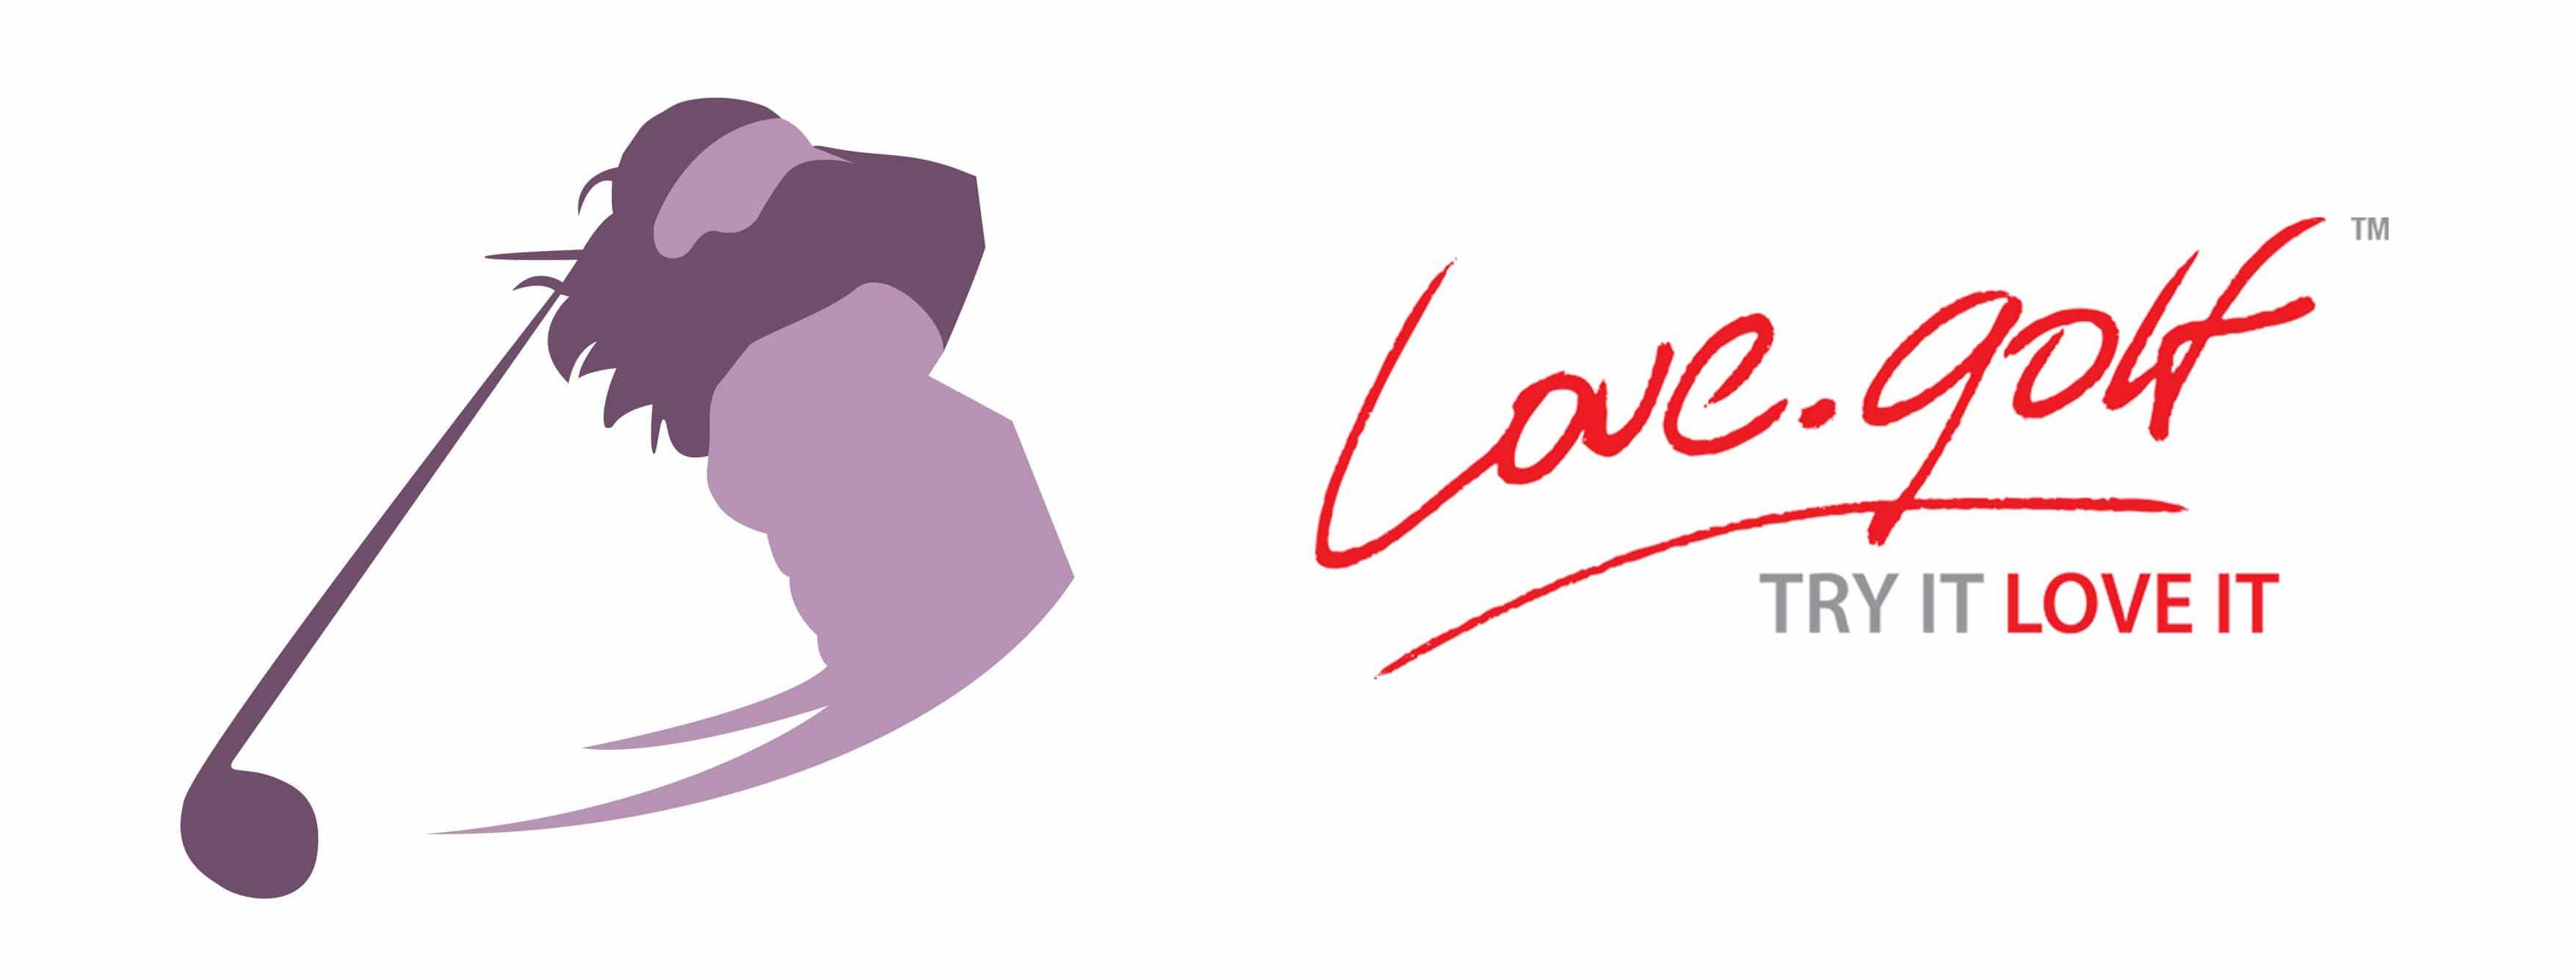 Image of kelly bridges silhouette completing her golf backswing alongside official logo of Love.golf